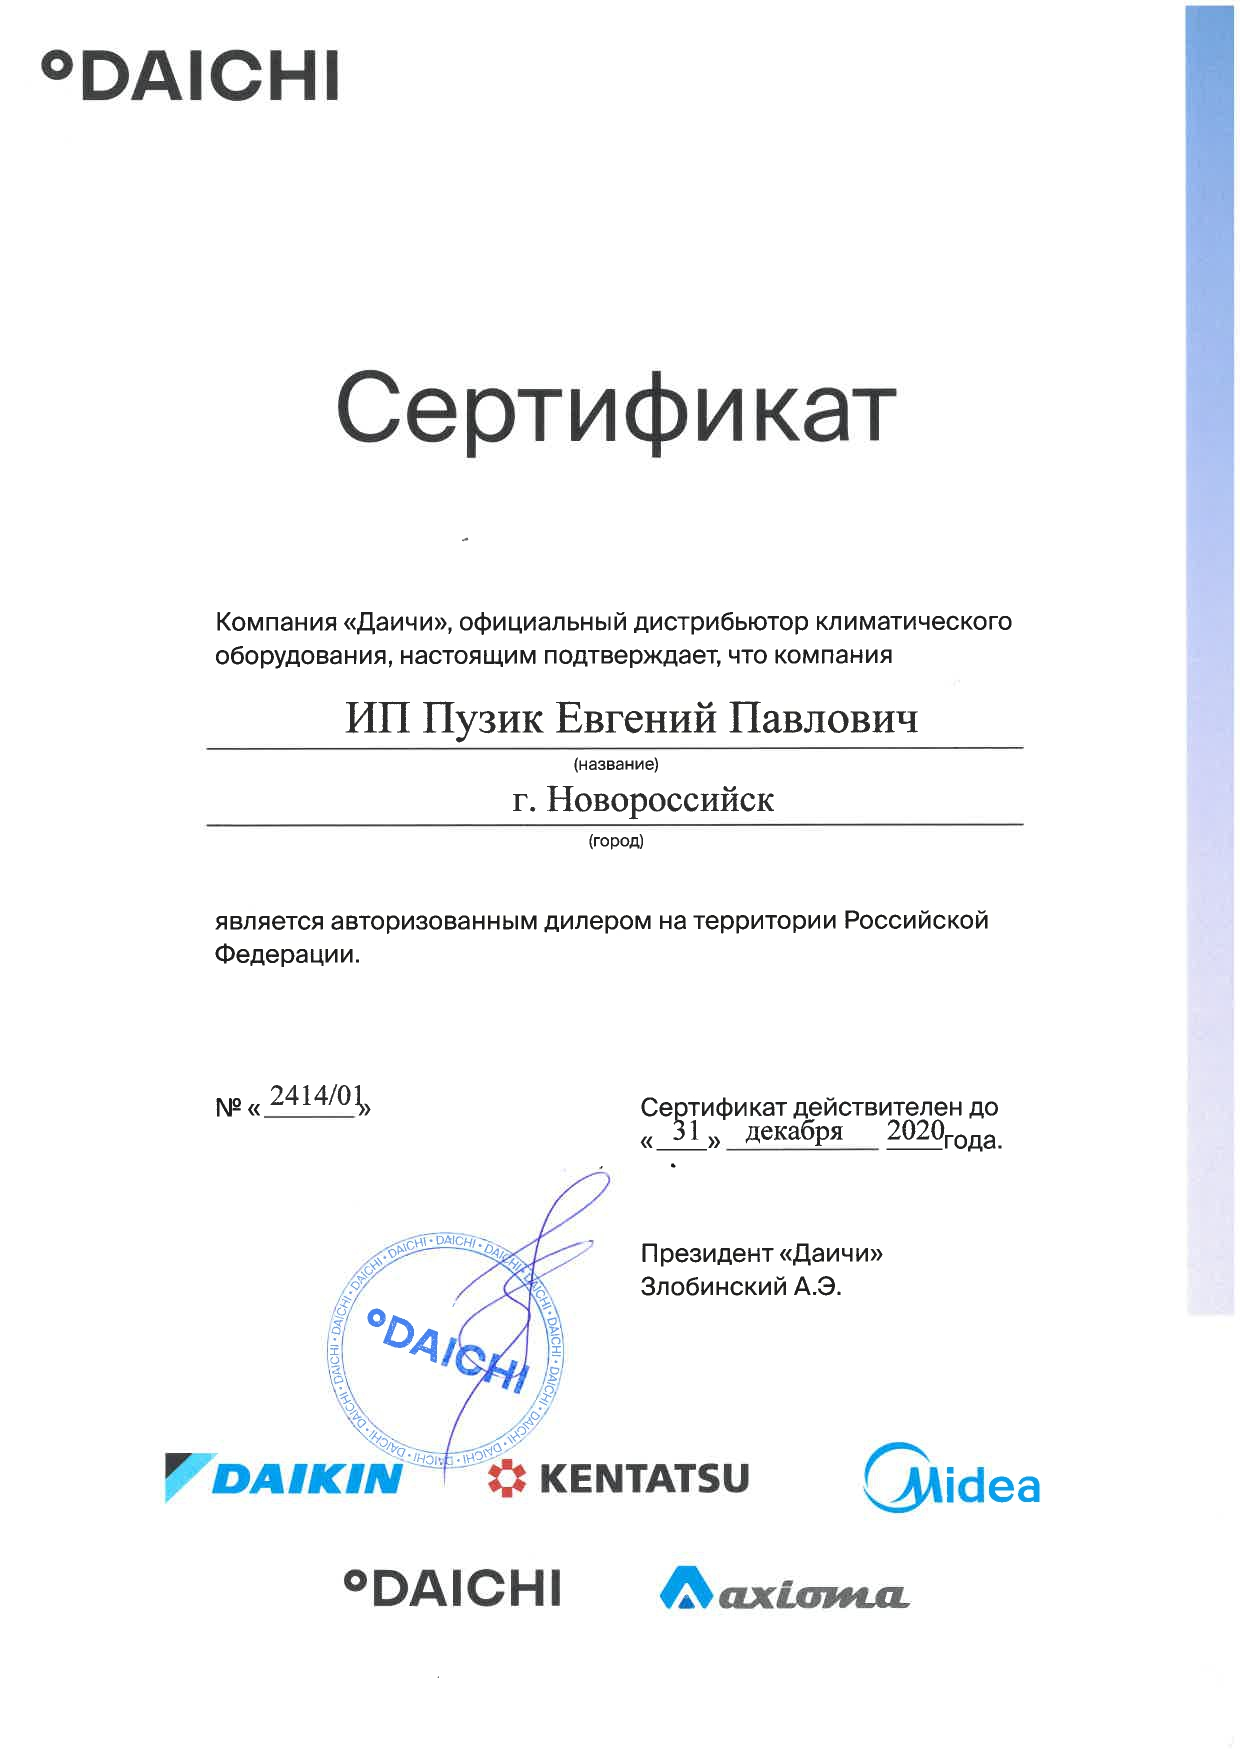 Daichi sertifikat diller